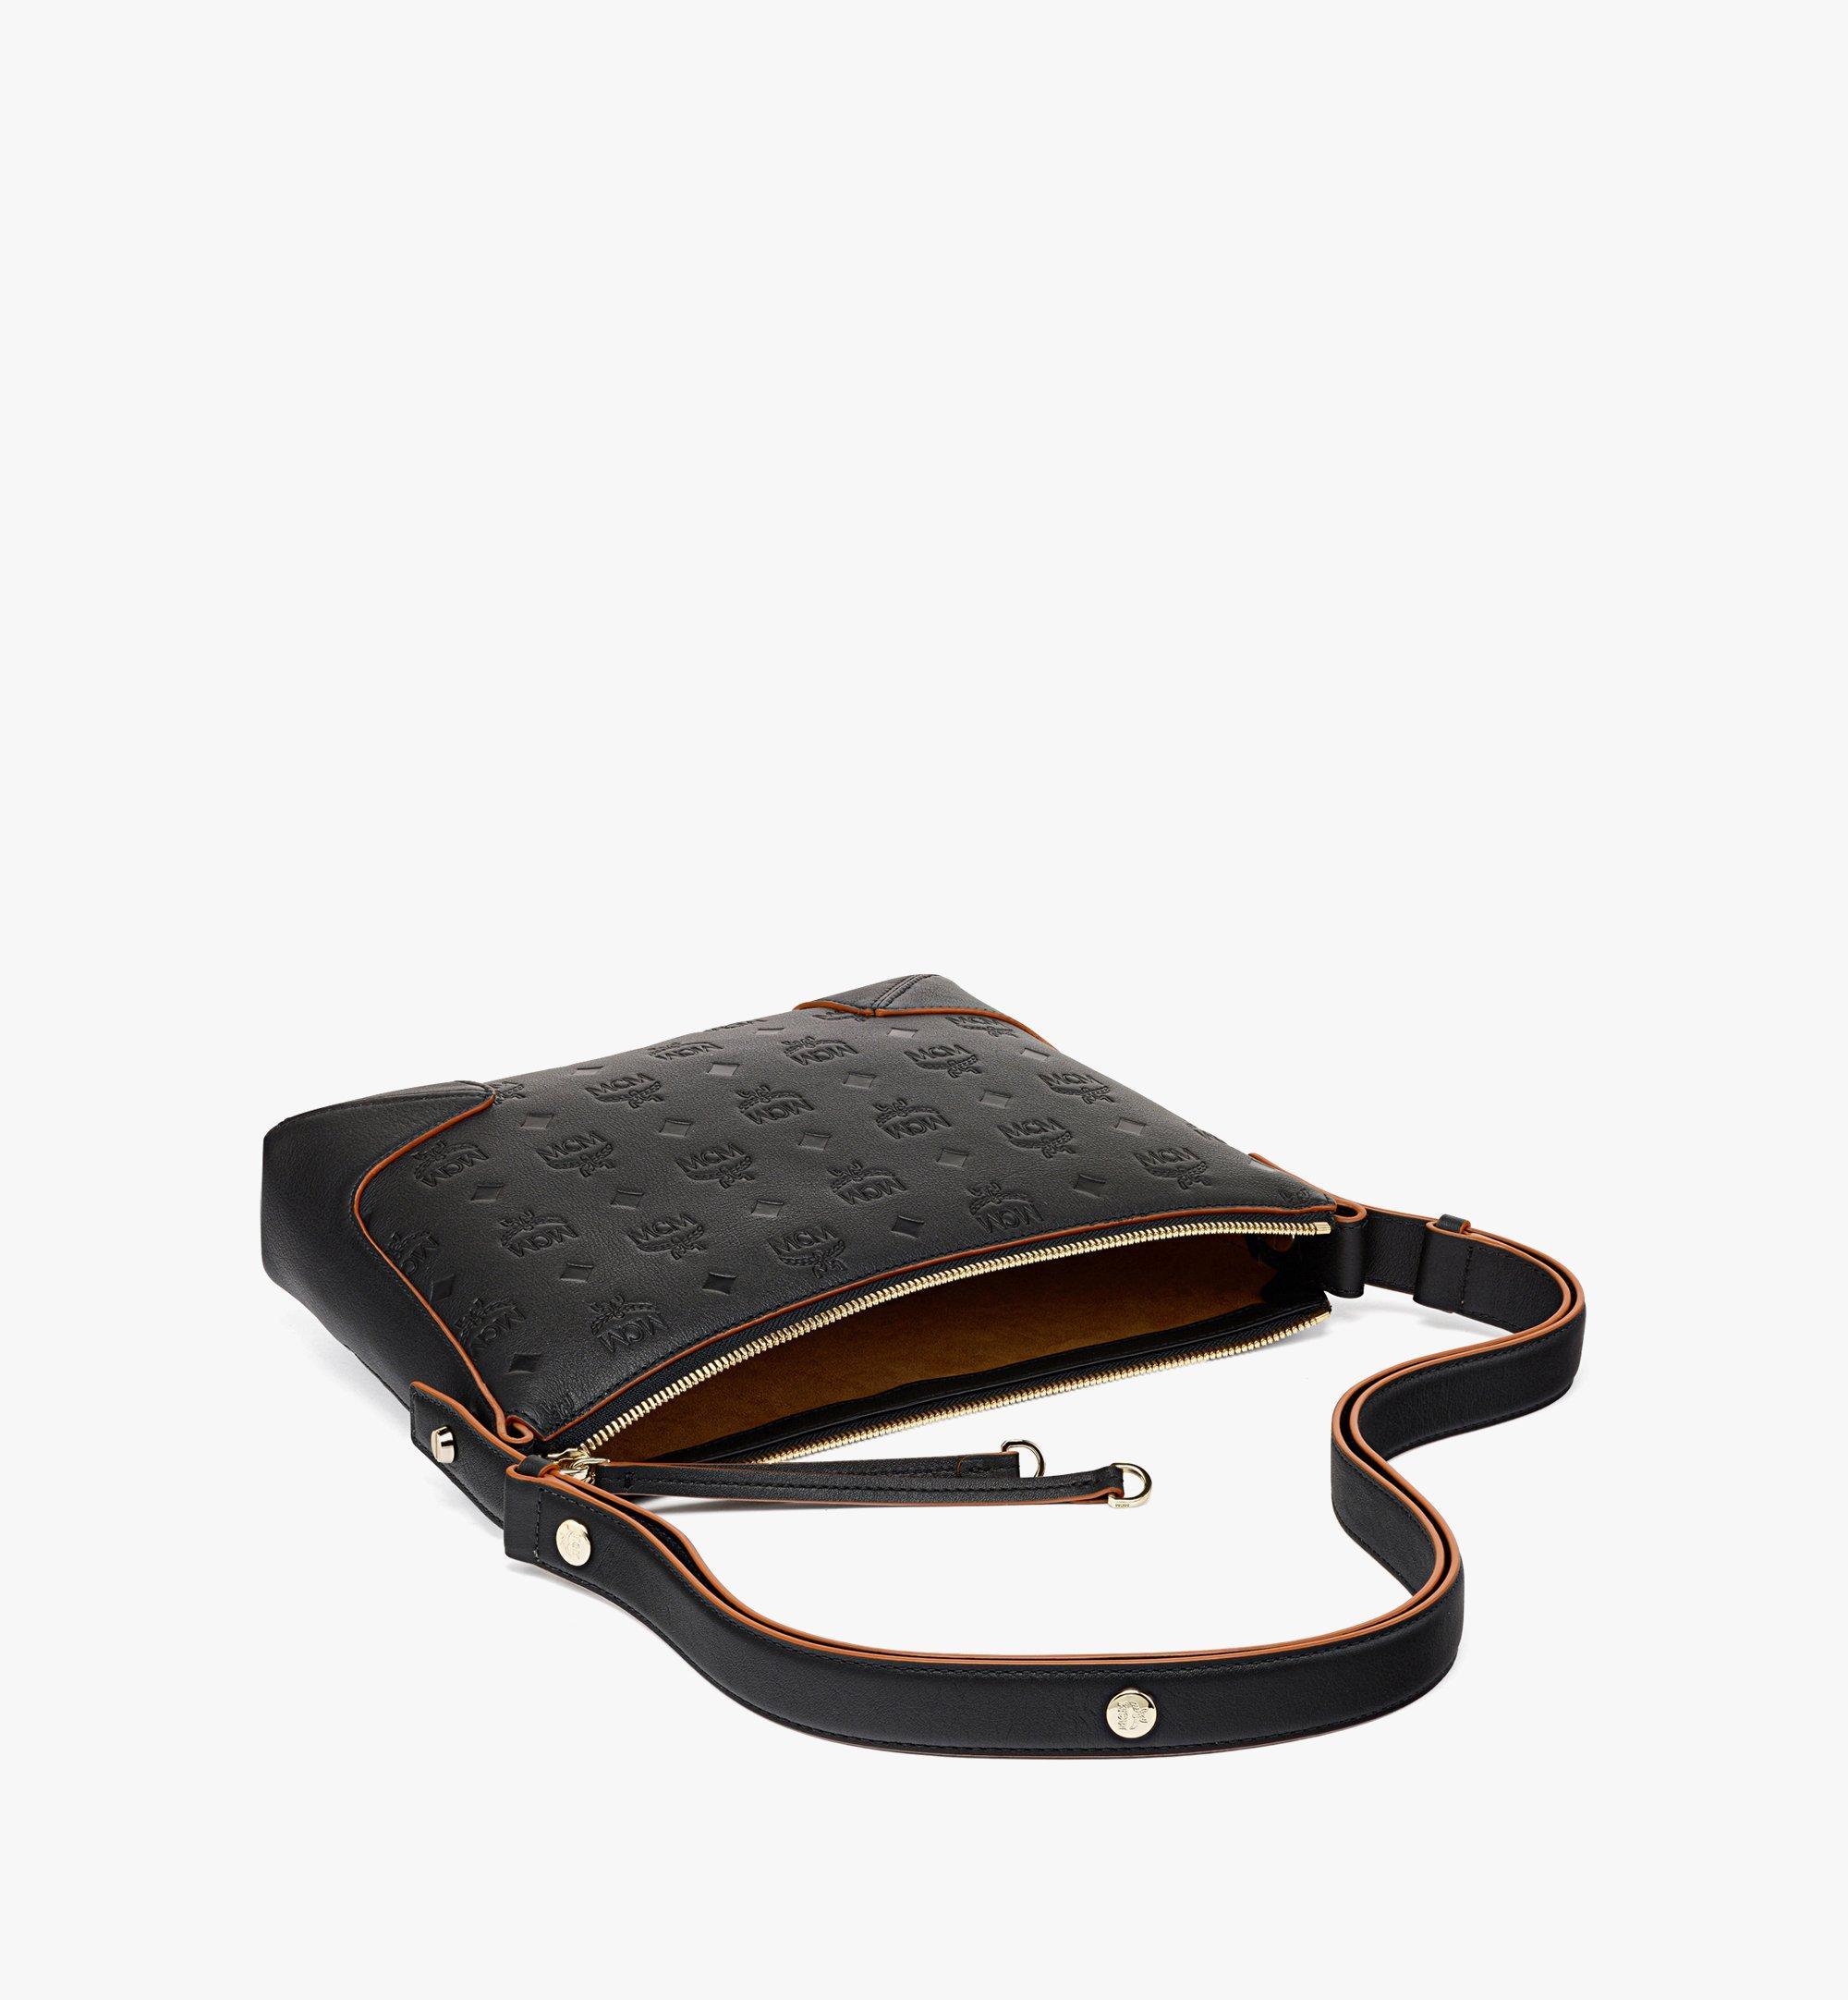 MCM Klara Shoulder Bag in Monogram Leather Black MWSBSKM02BK001 Alternate View 2